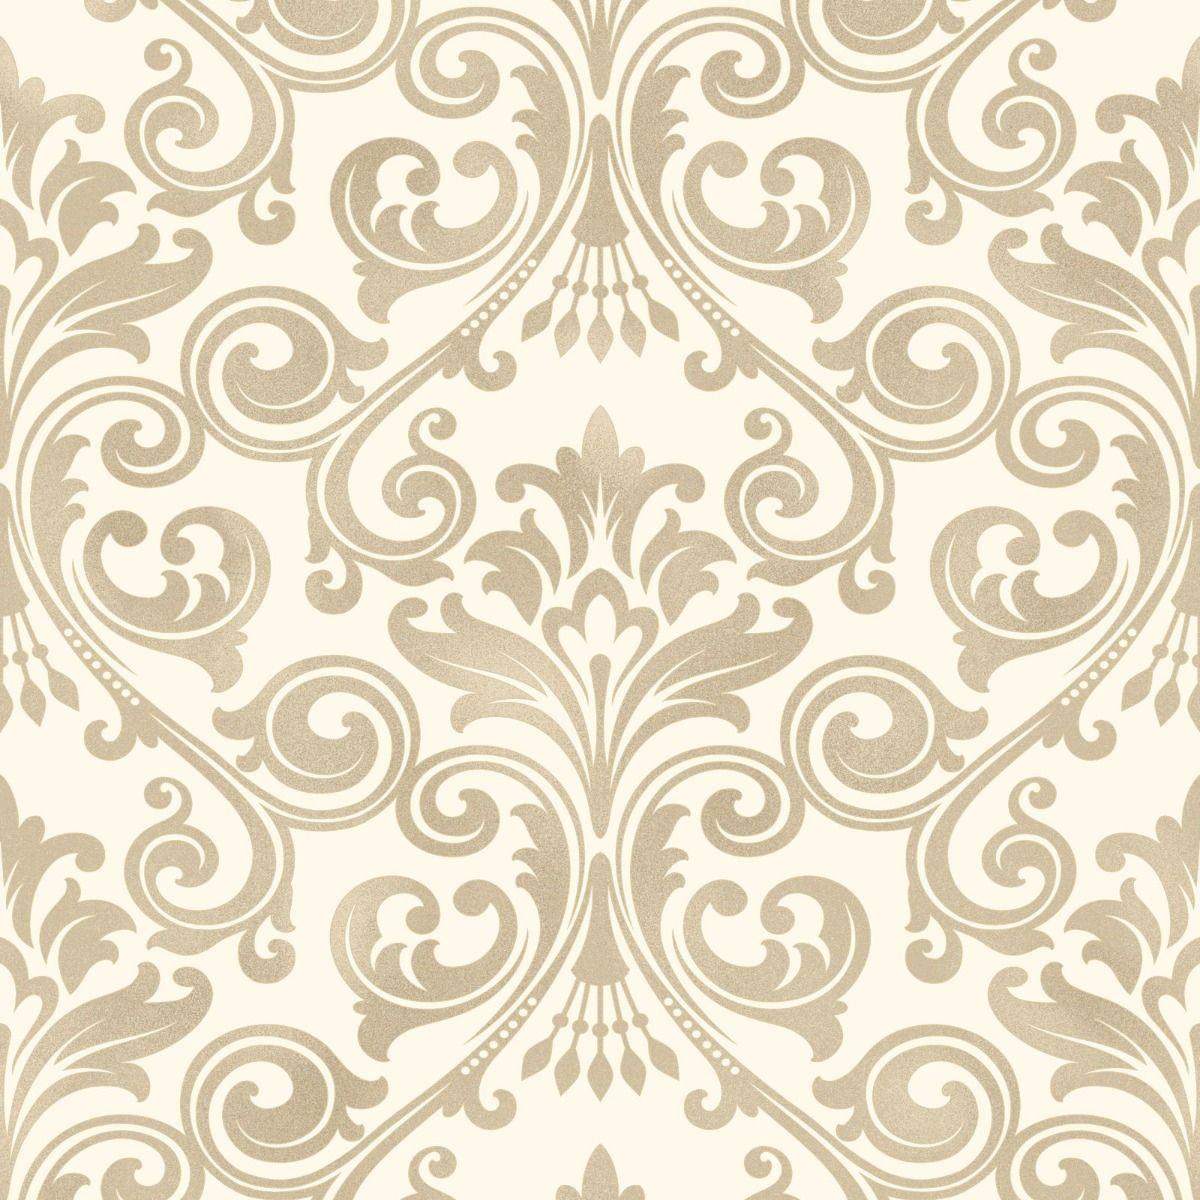 Damask Glitter Wallpaper Cream Gold Vinyl Luxury Textured Fine